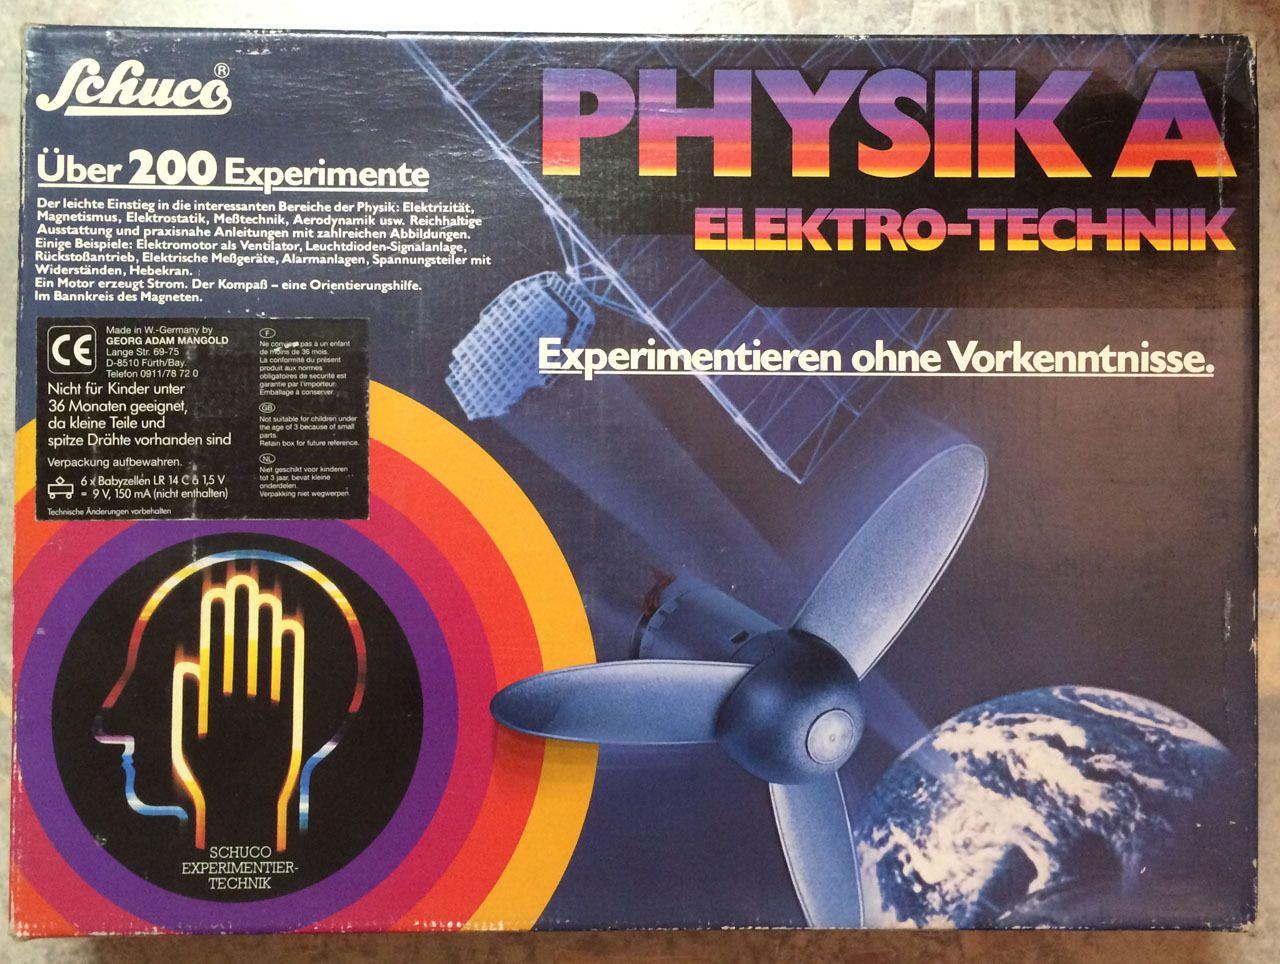 Schuco Physik A Elektro-Technik A6501, Experimentierkasten | eBay